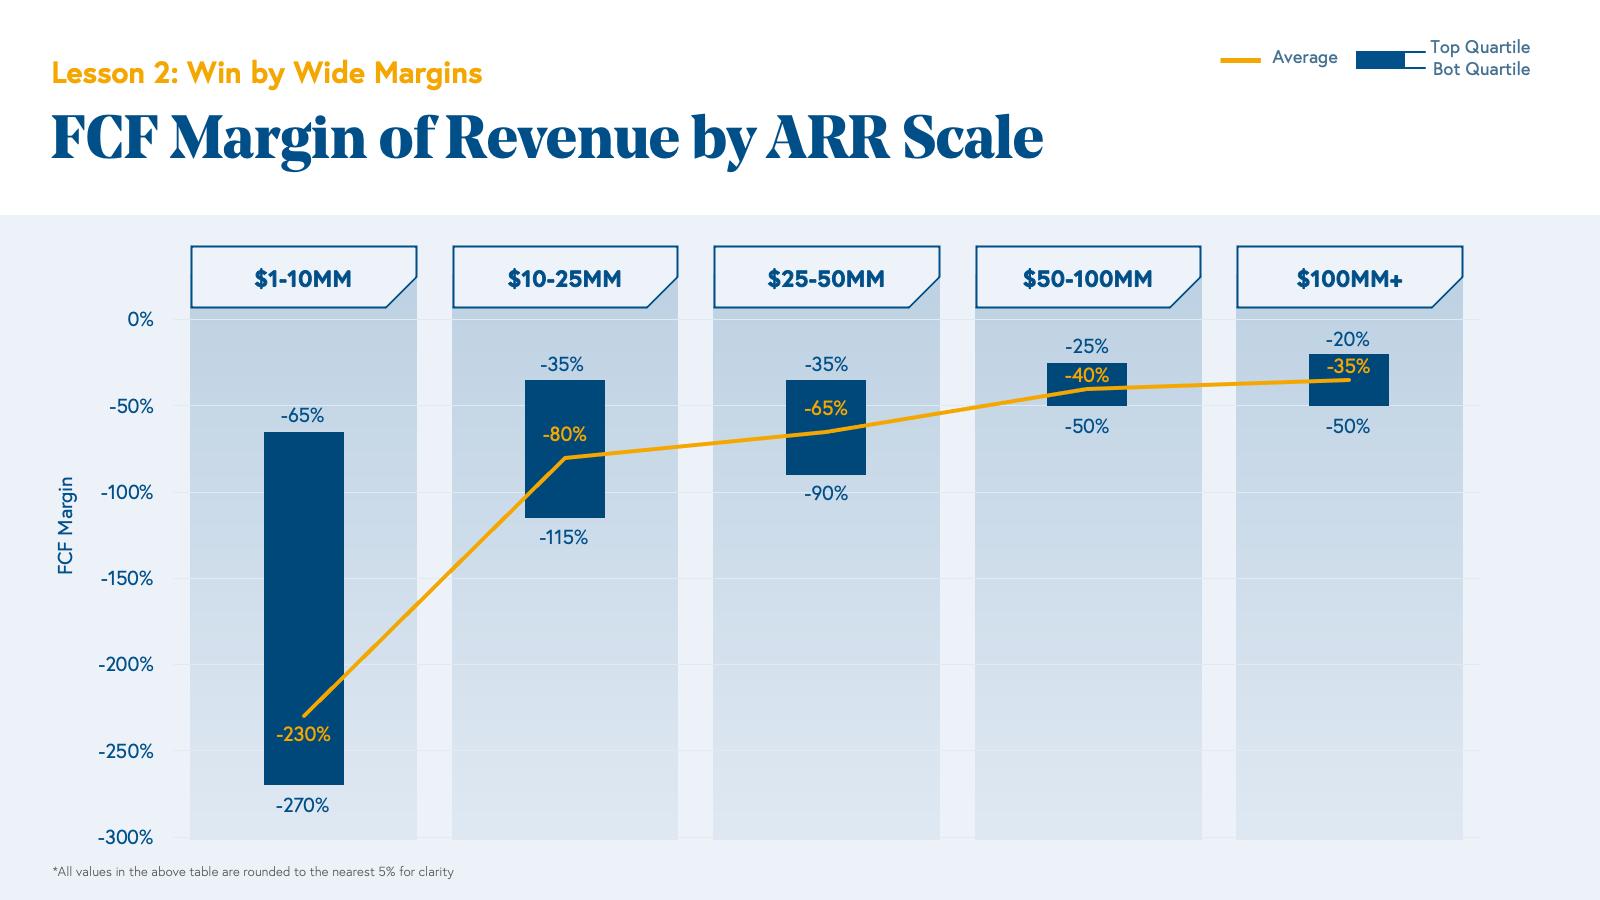 FCF Margin of Revenue by ARR Scale